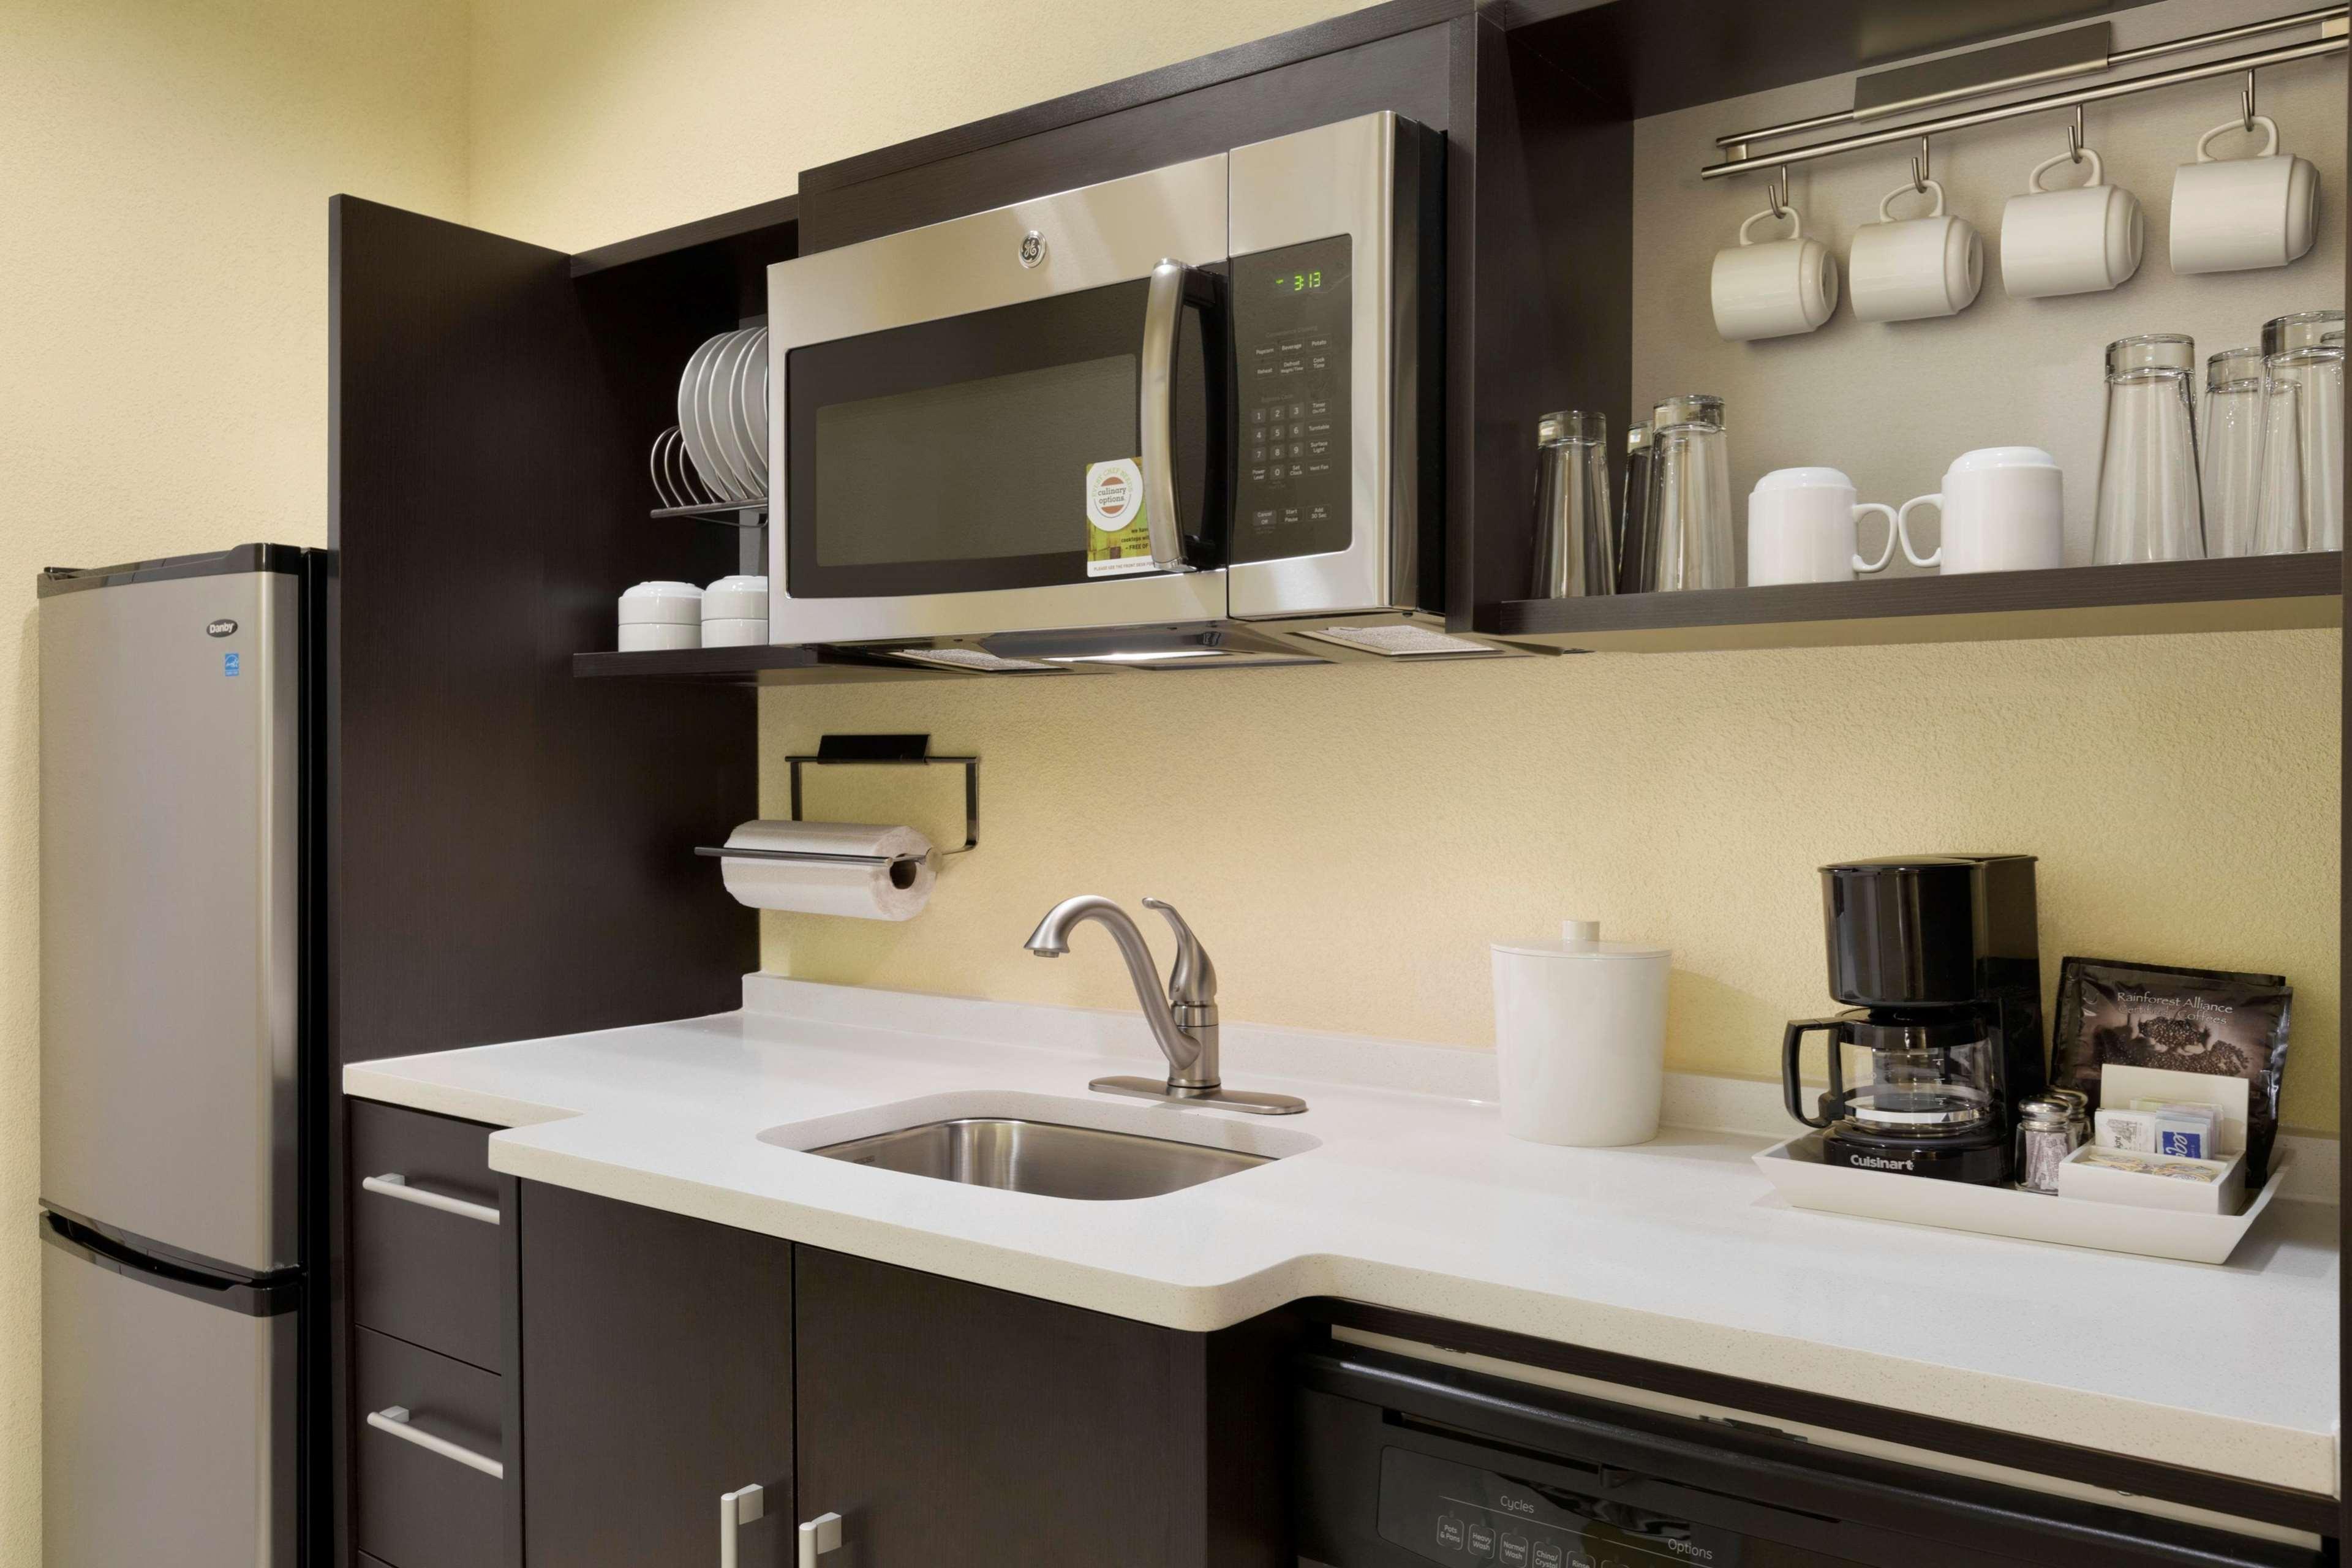 Home2 Suites by Hilton Houston Pasadena image 10